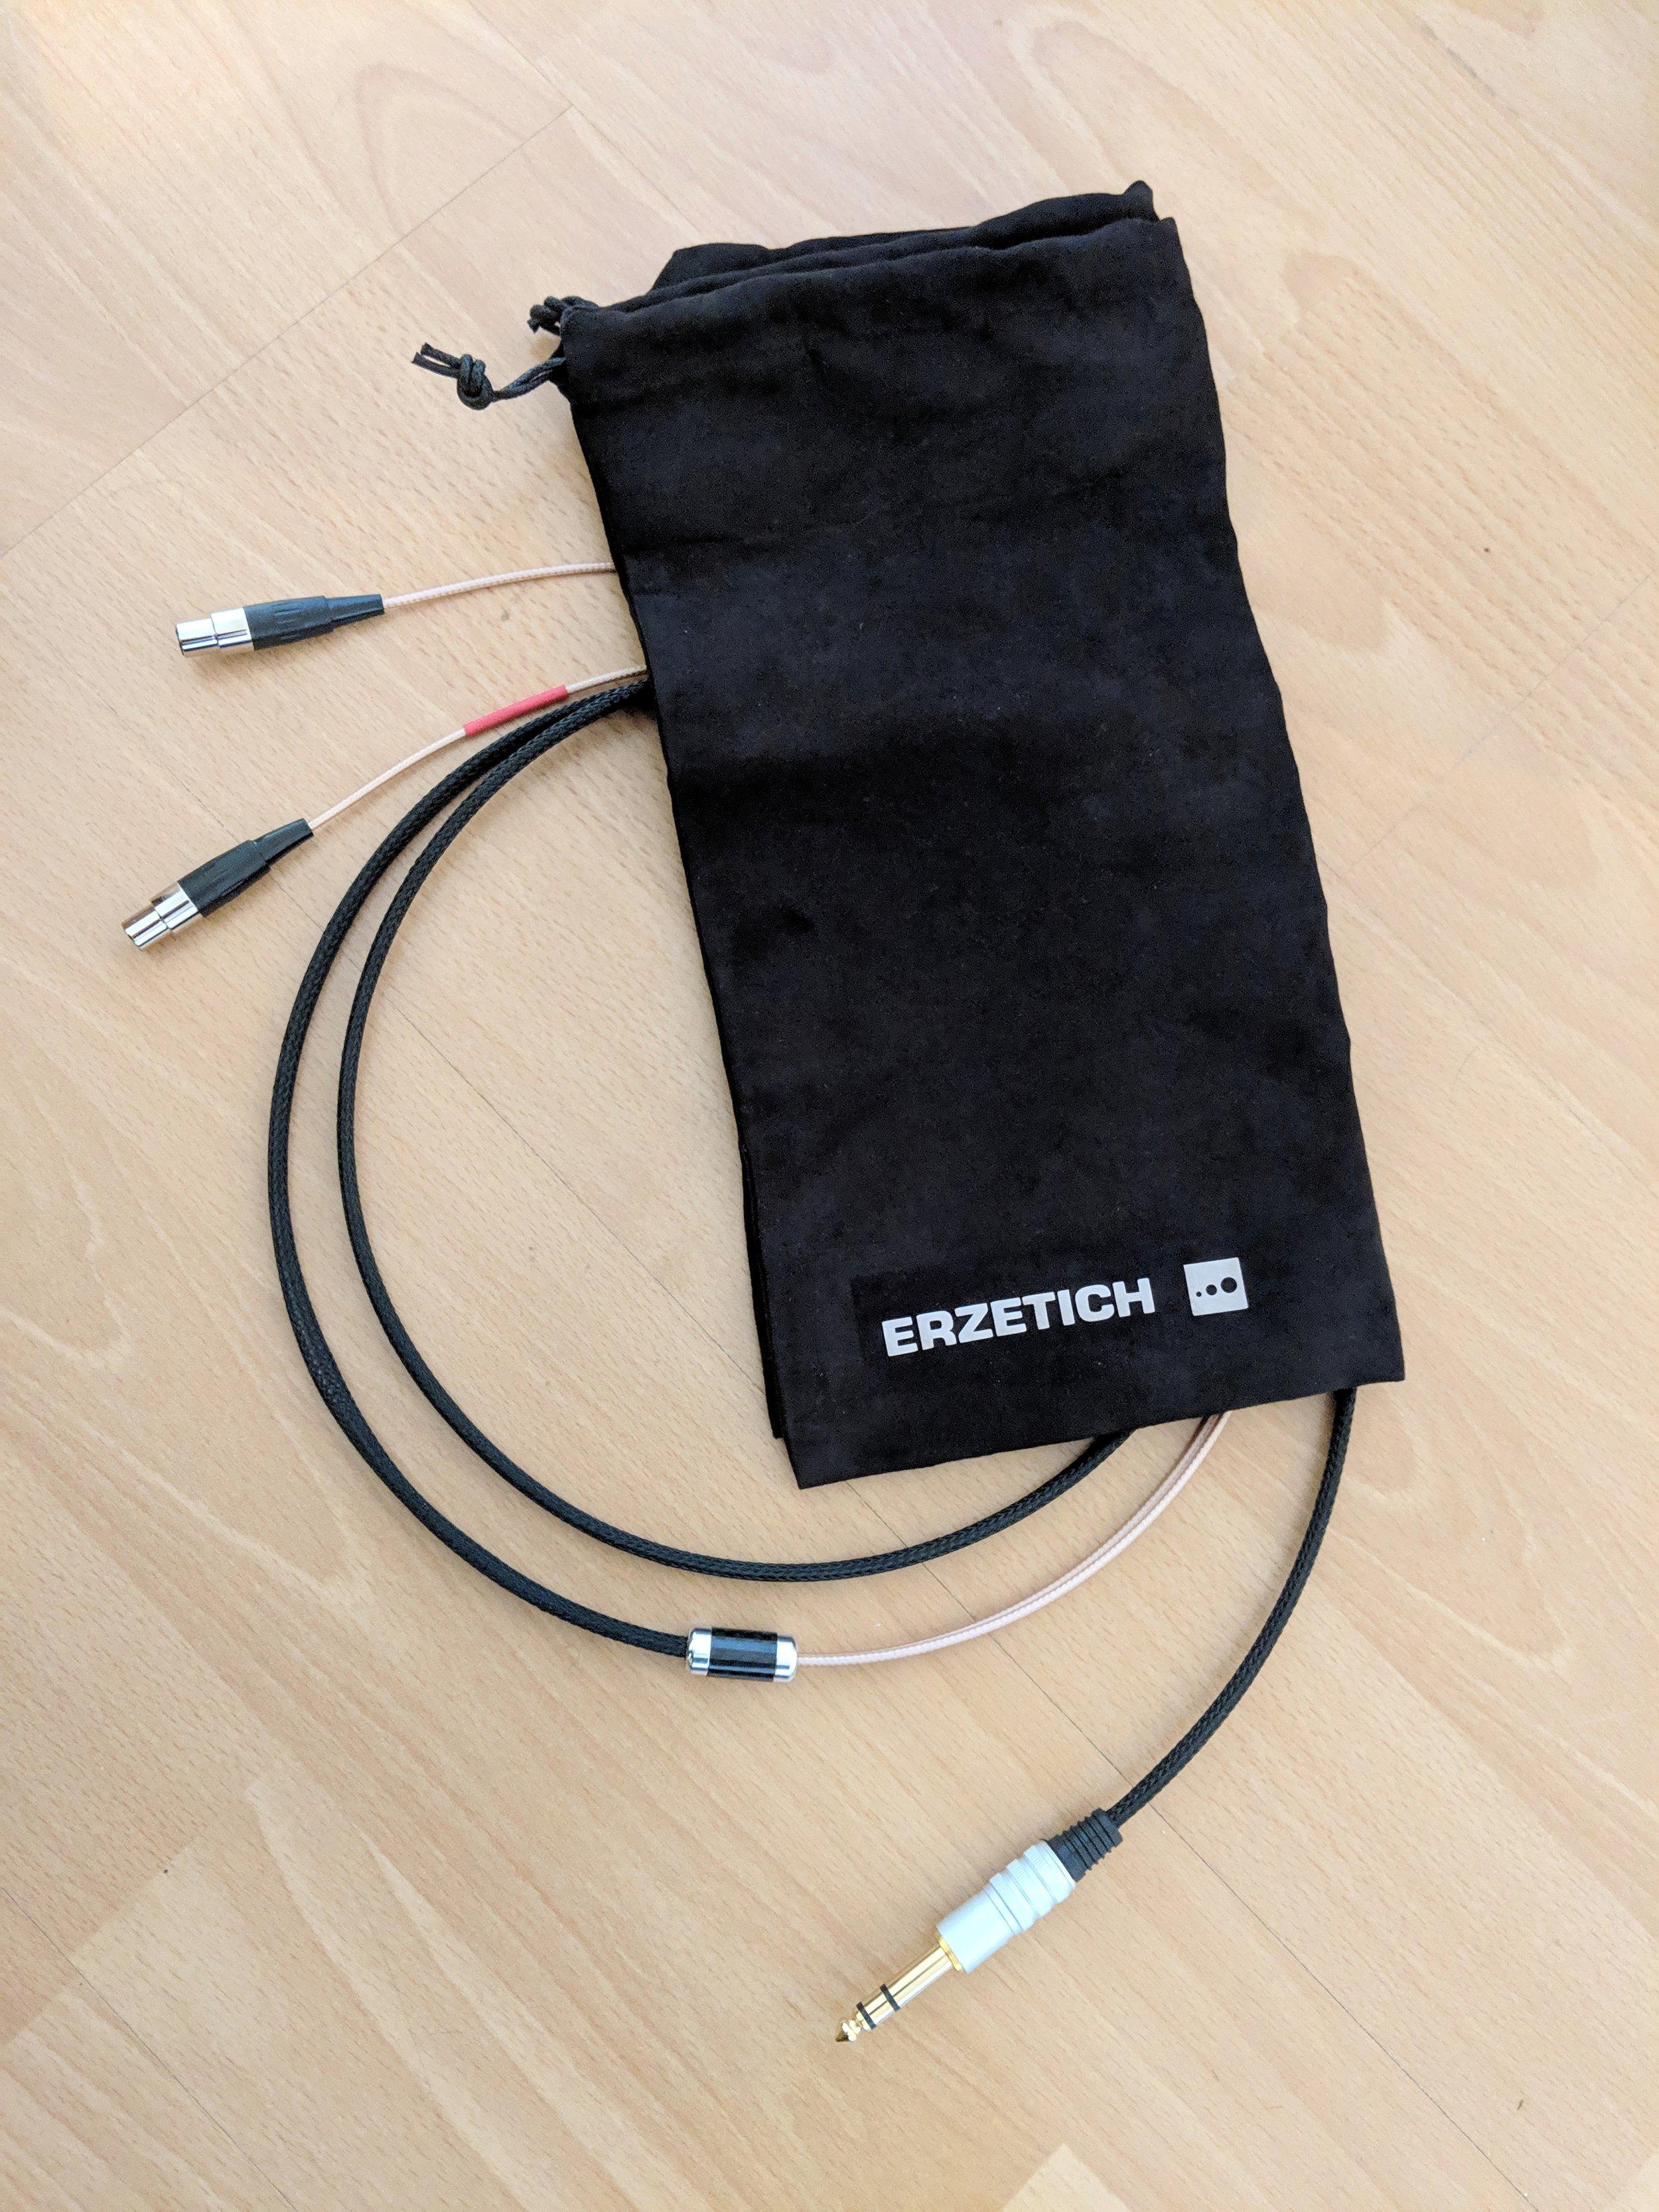 Erzetich Mania headphone review